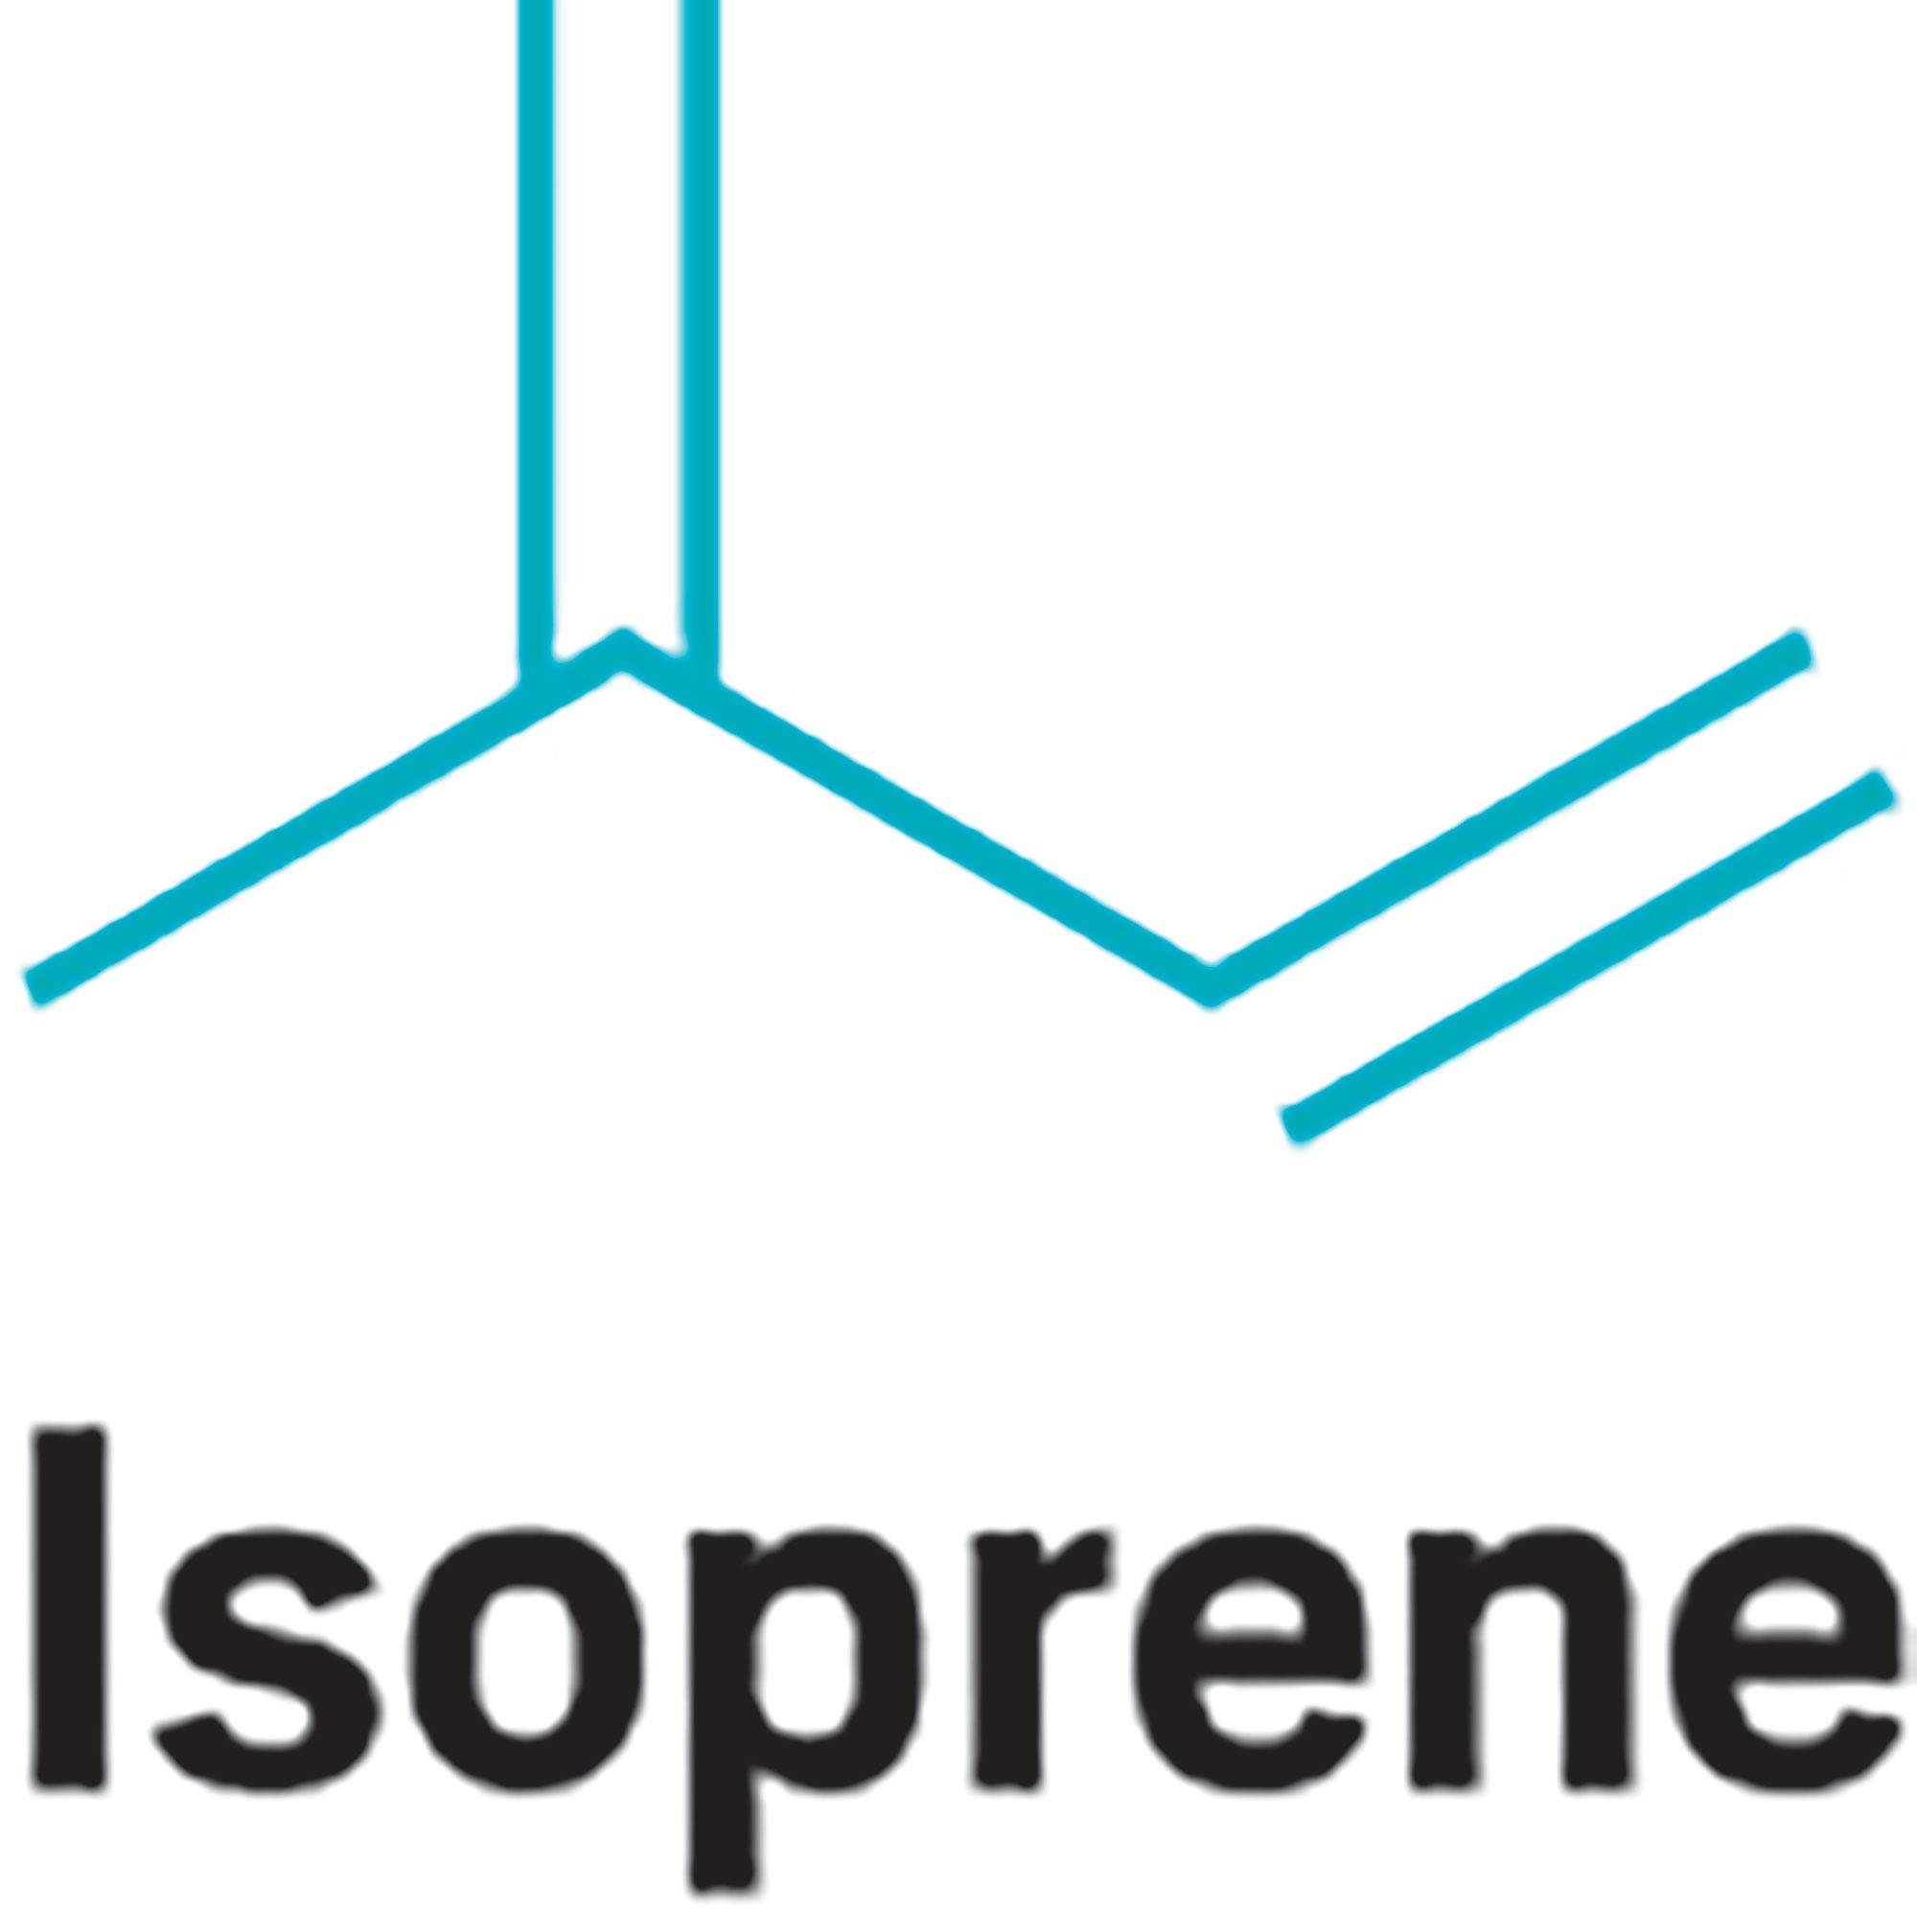 Gevo says new catalytic process makes cheap bio-isoprene